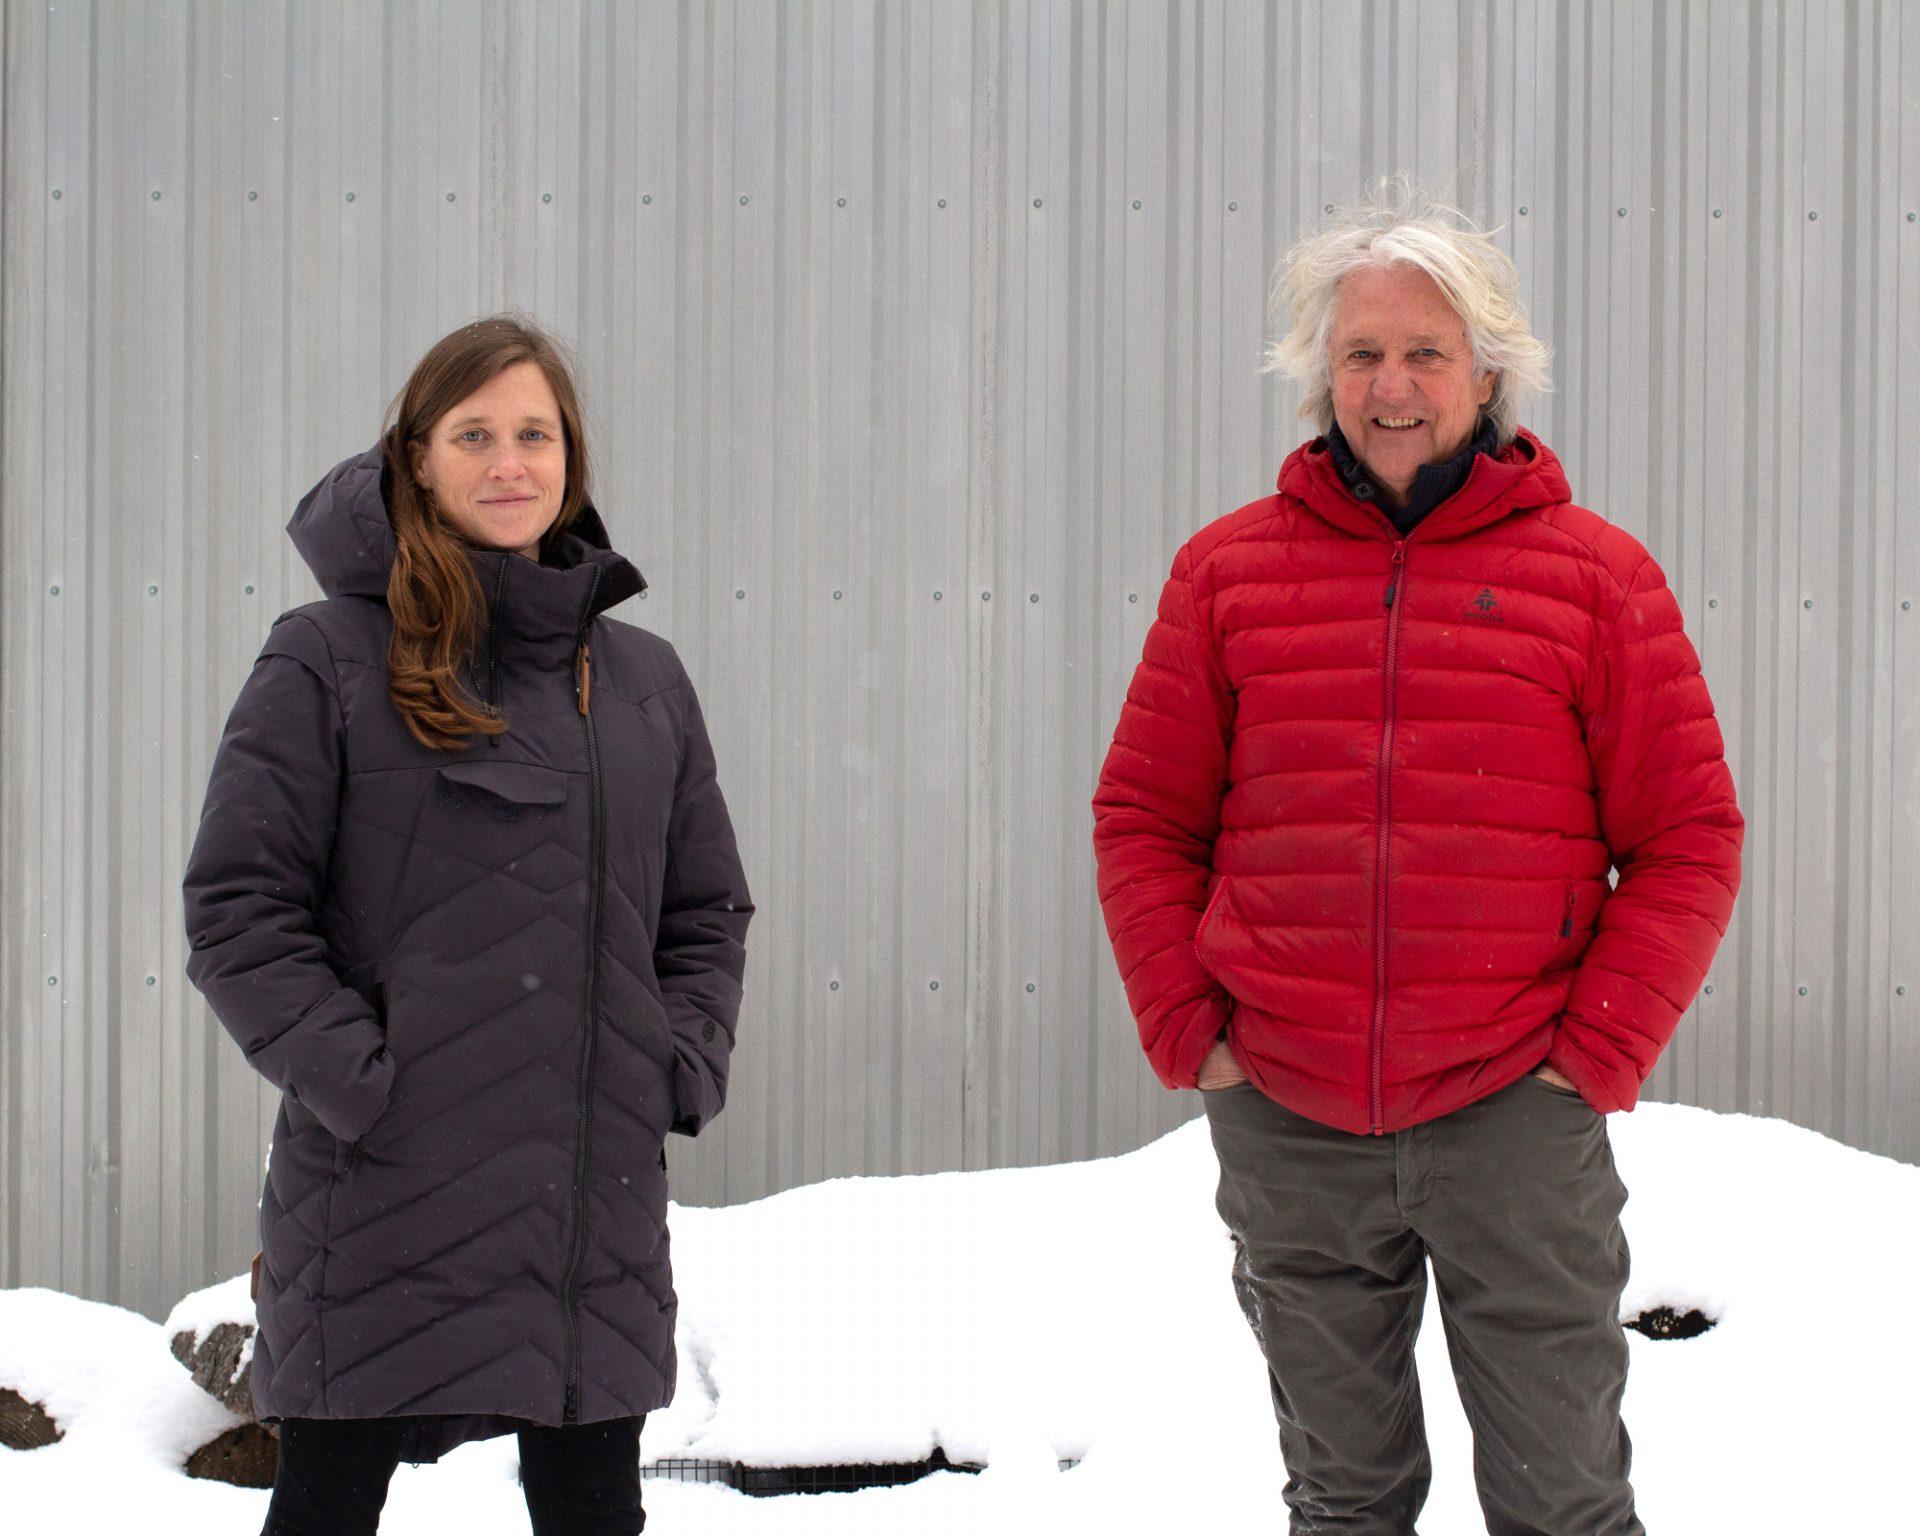 Kate Schneider and John Hartman